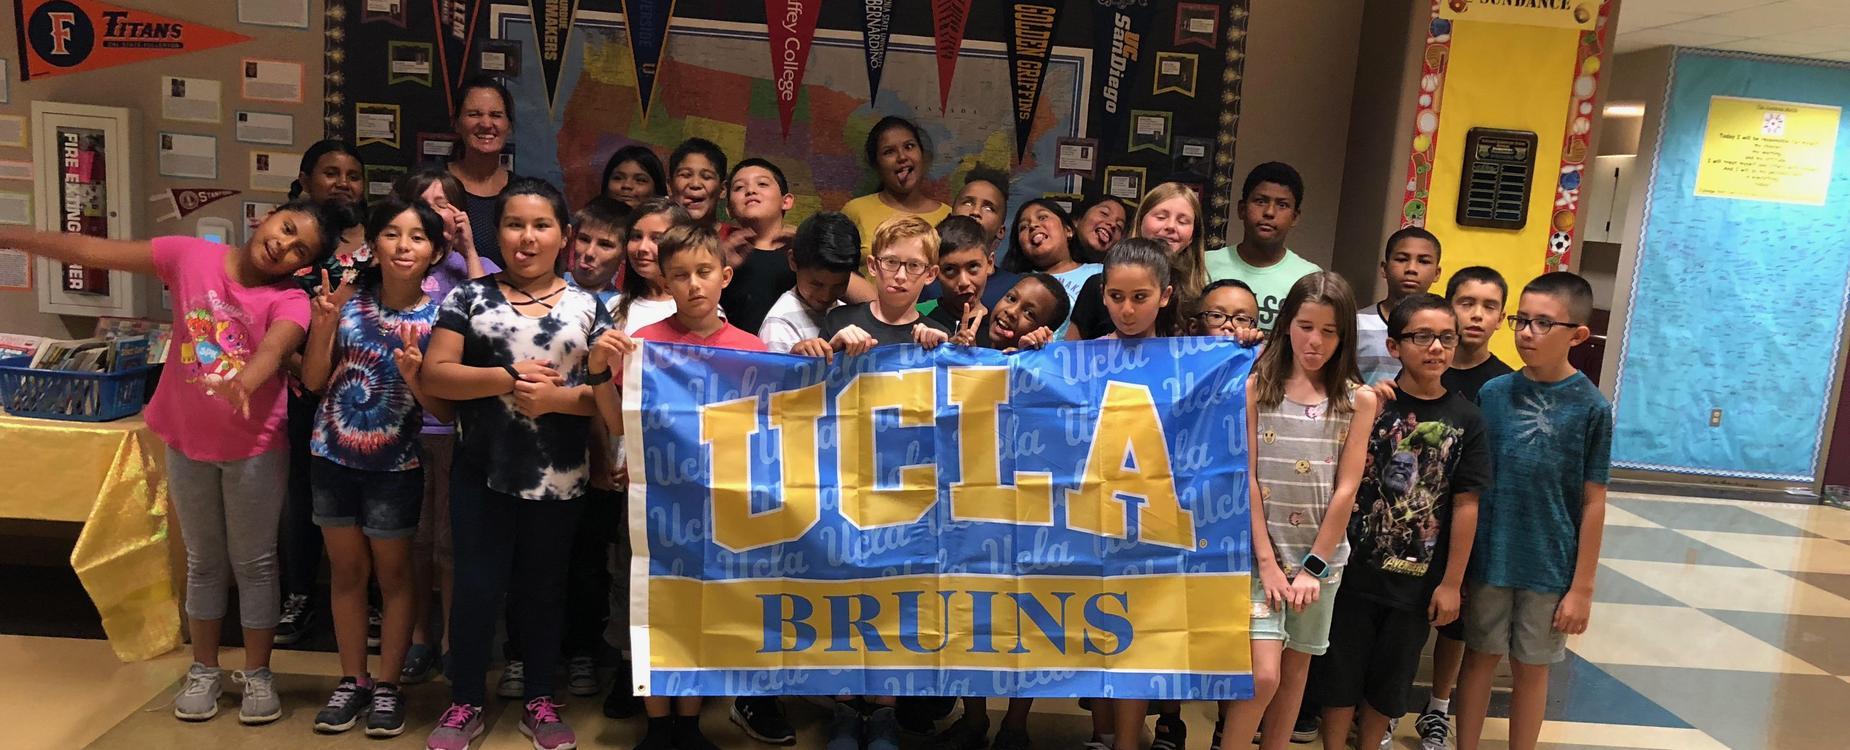 Sundance is representing UCLA